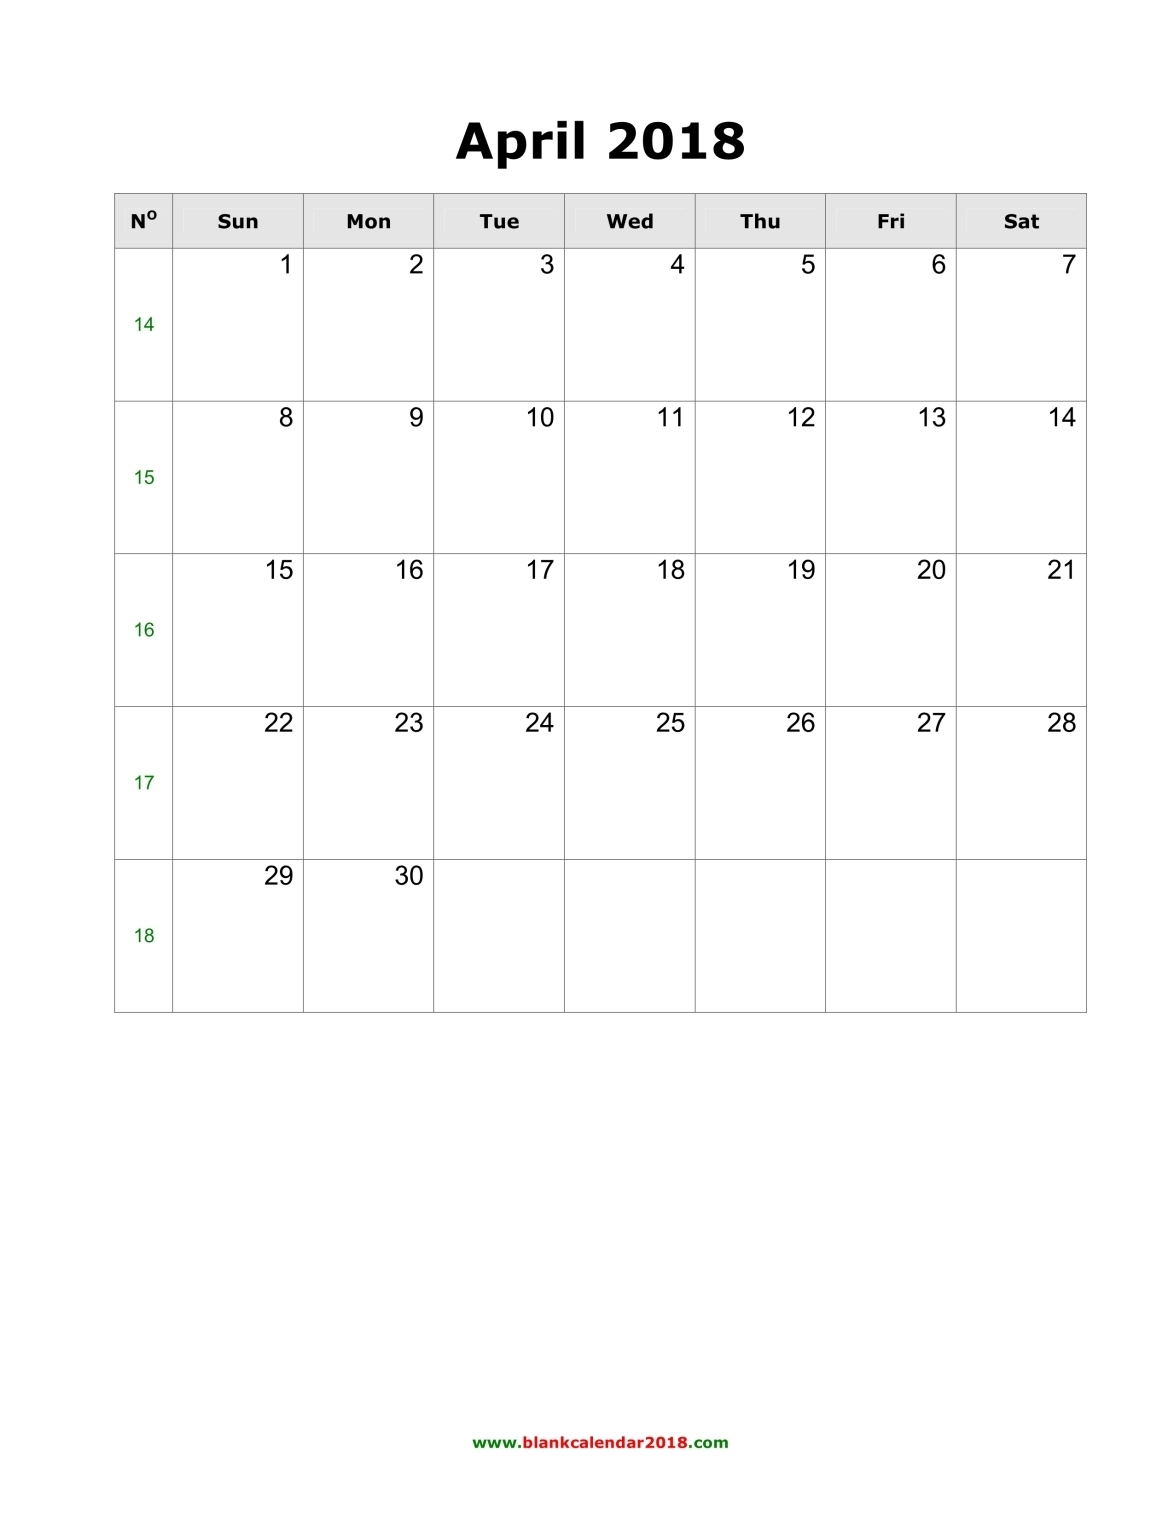 Blank Calendar for April 2018